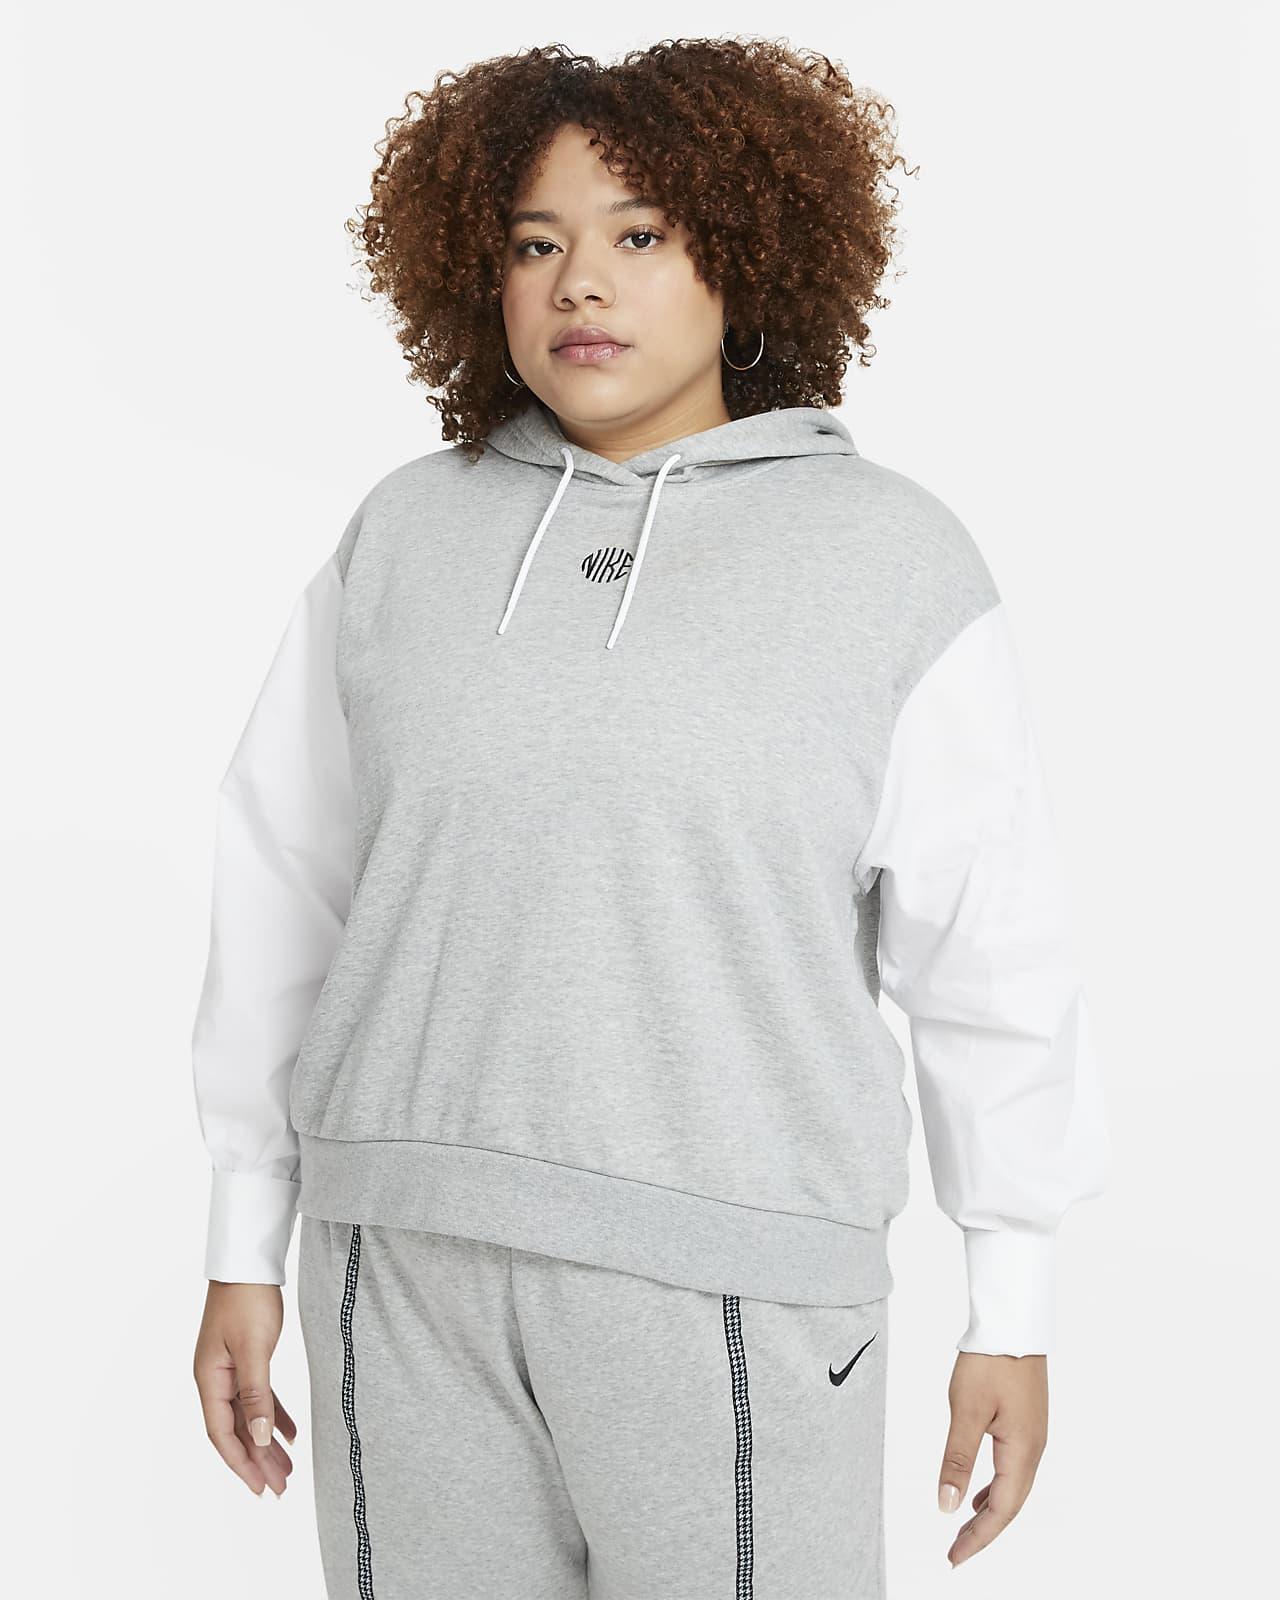 Huvtröja Nike Sportswear Icon Clash för kvinnor (Plus Size)